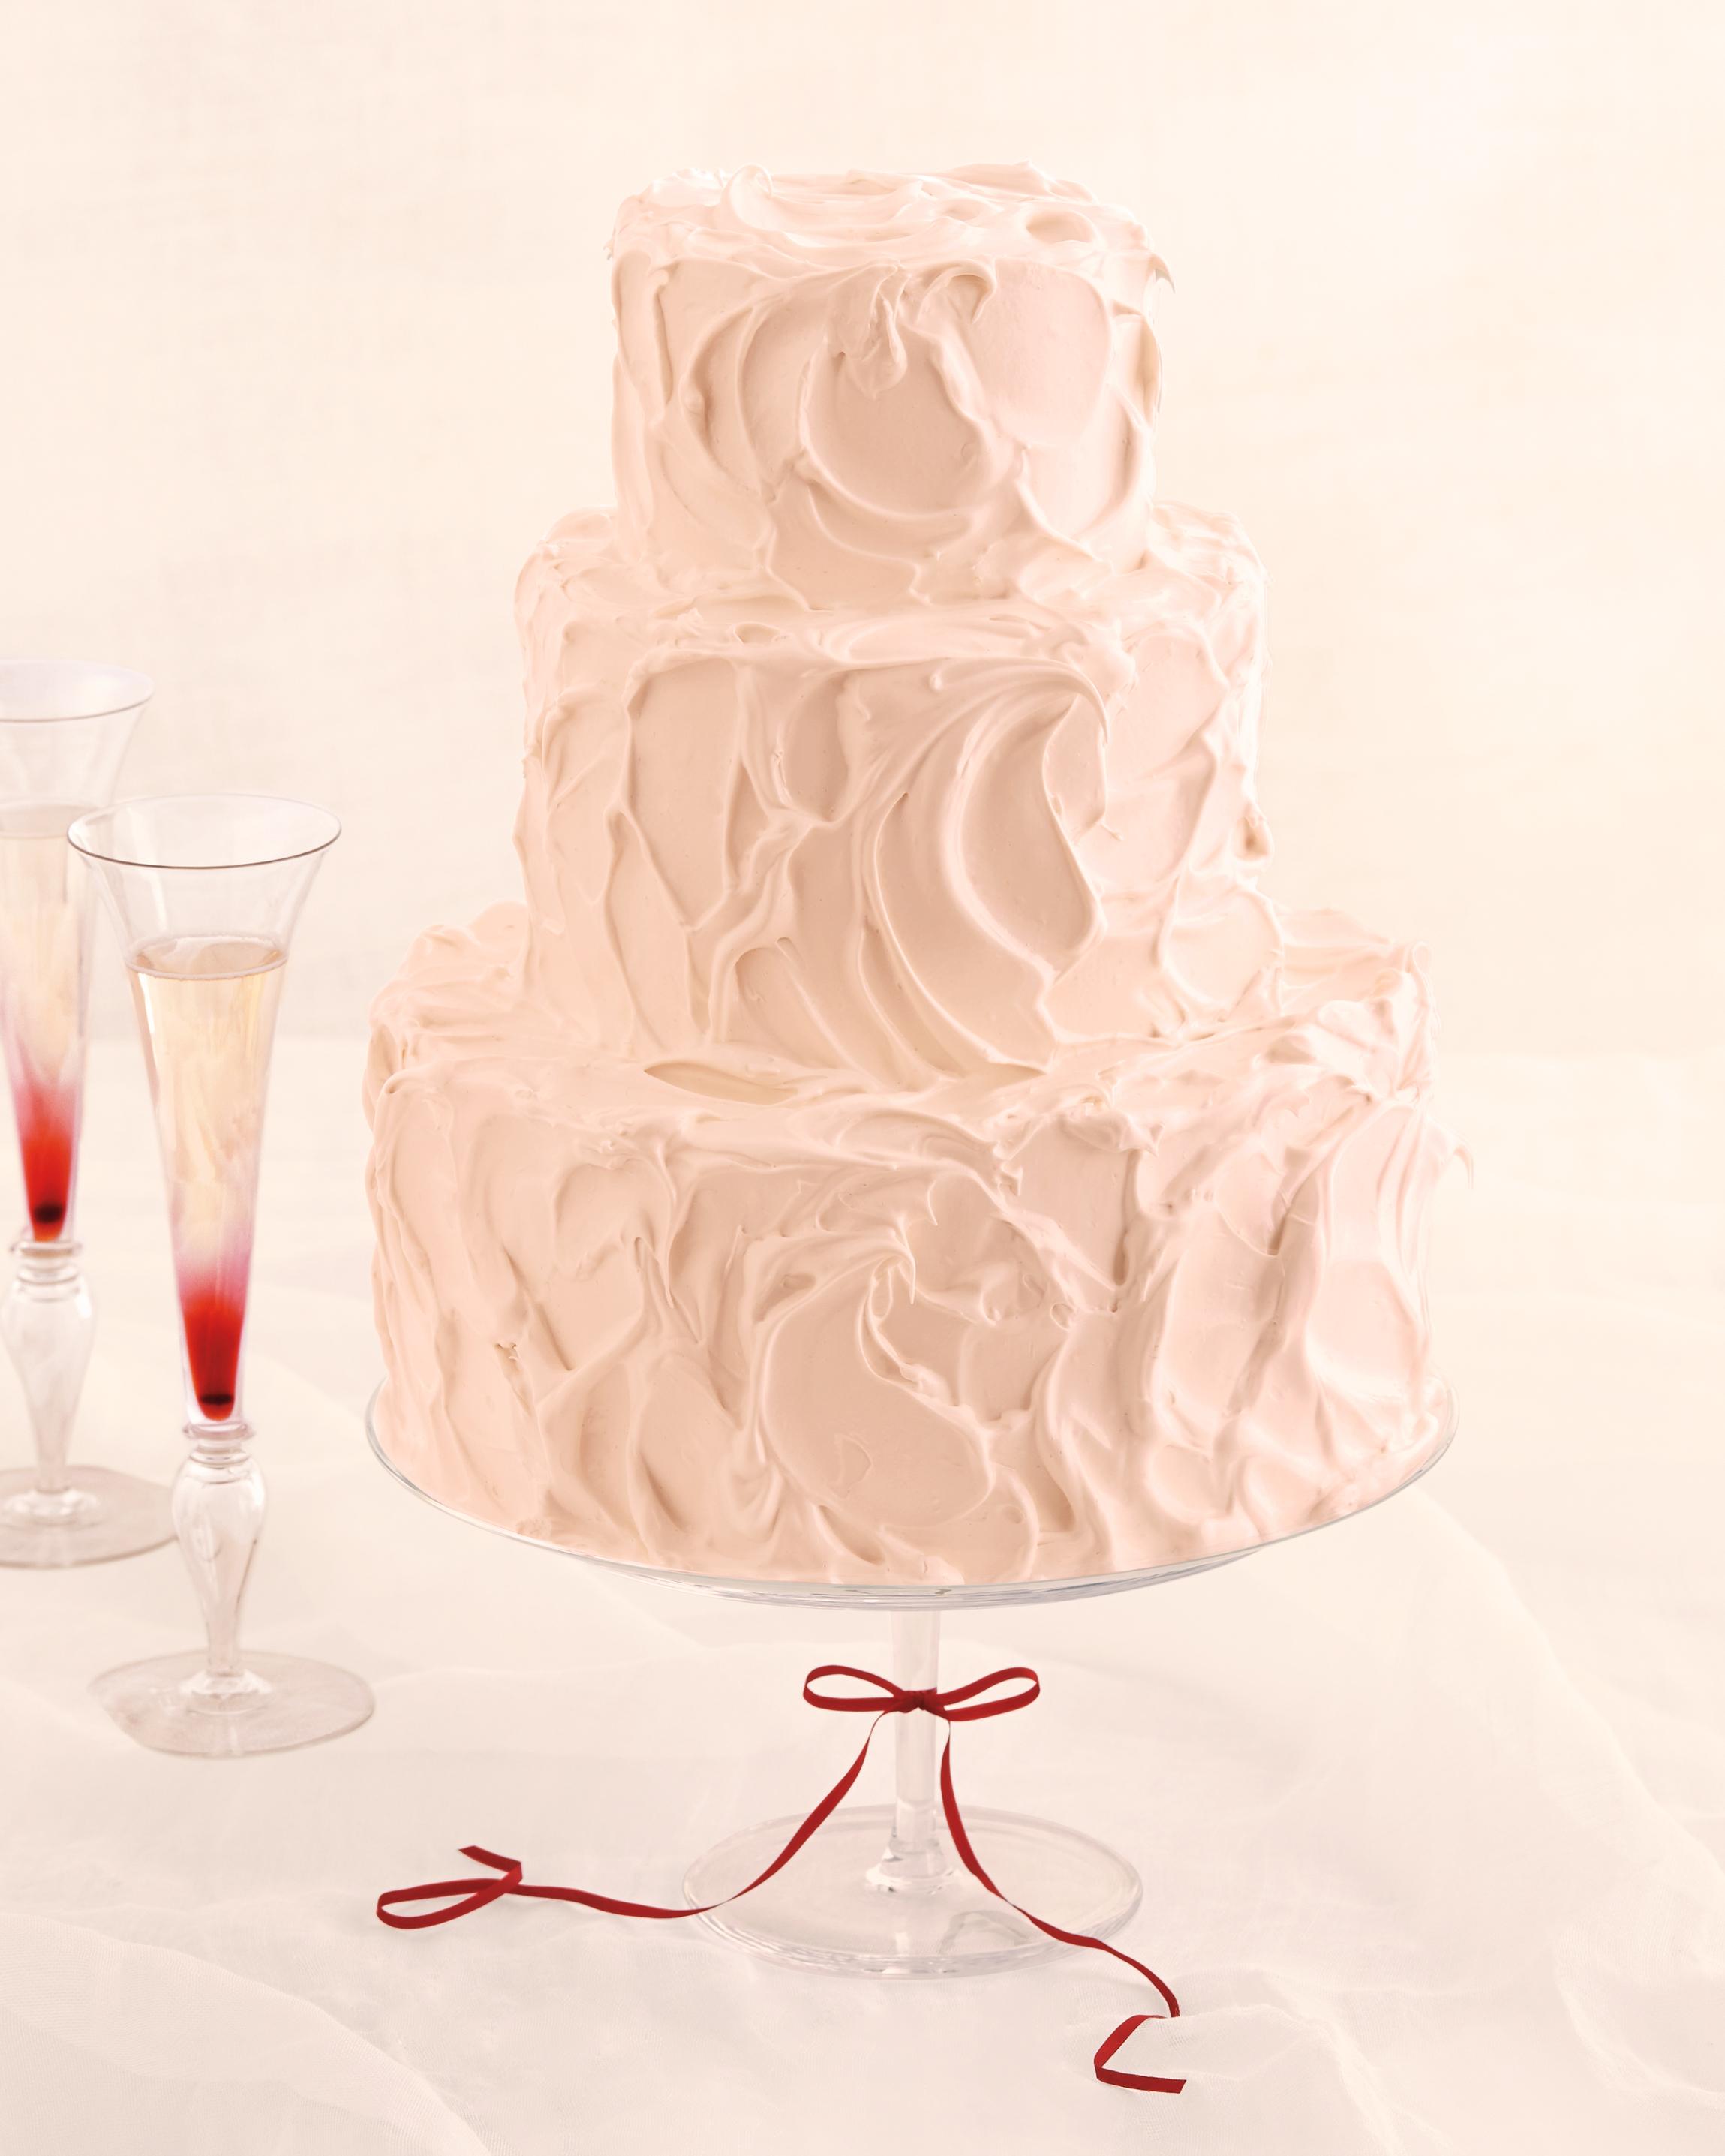 wedding-cake-pink-kir-royale-v1-109-d111828-comp.jpg